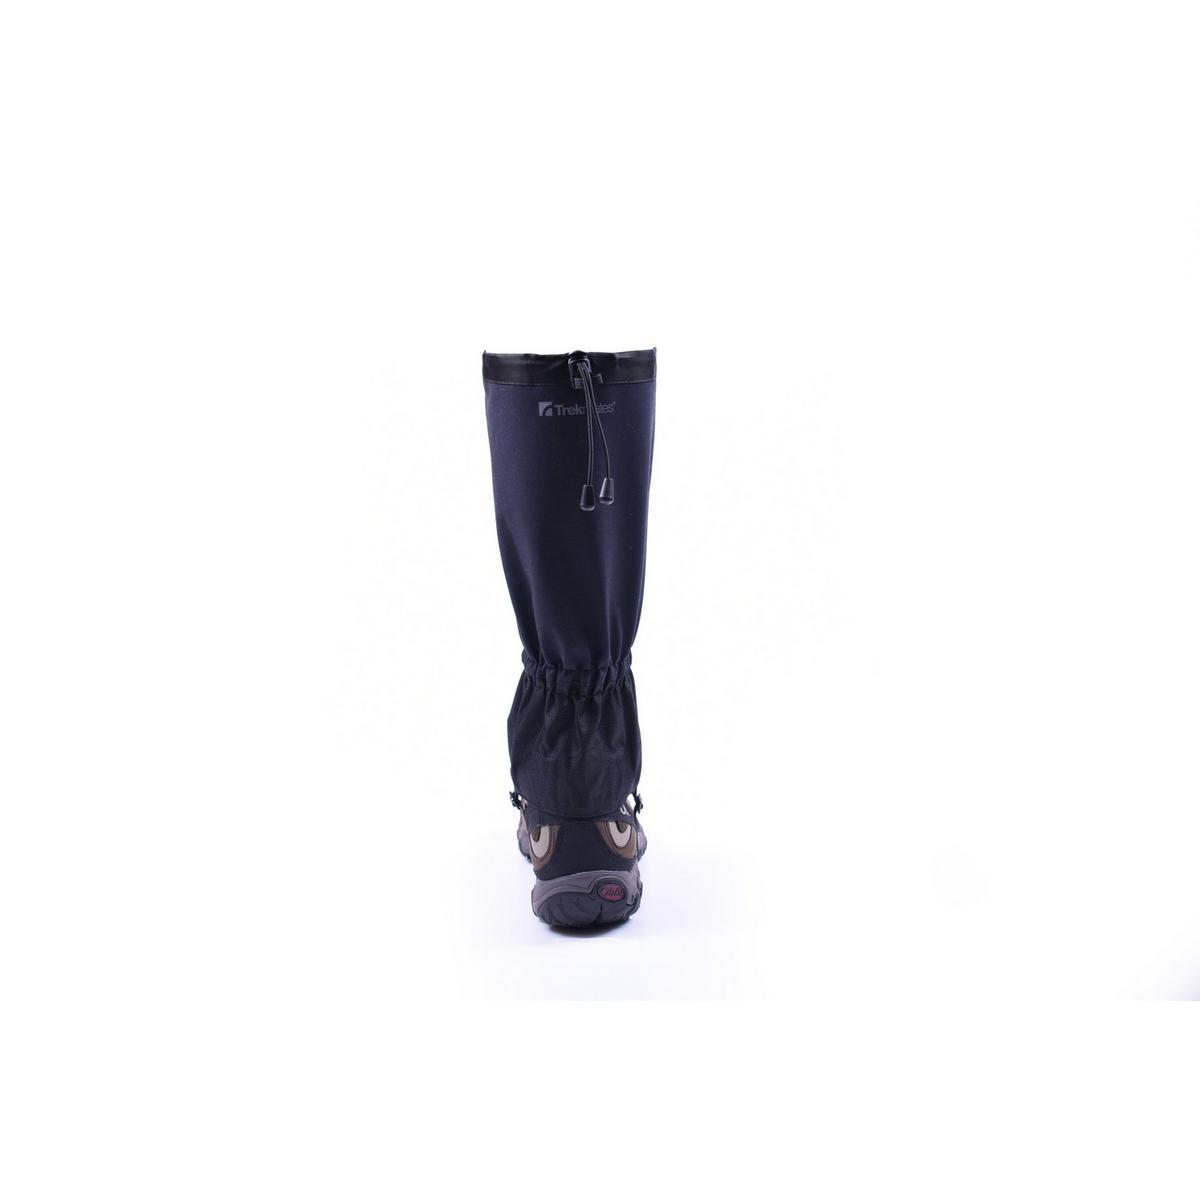 Trek Mates Cairngorm GTX Gaiter - Black